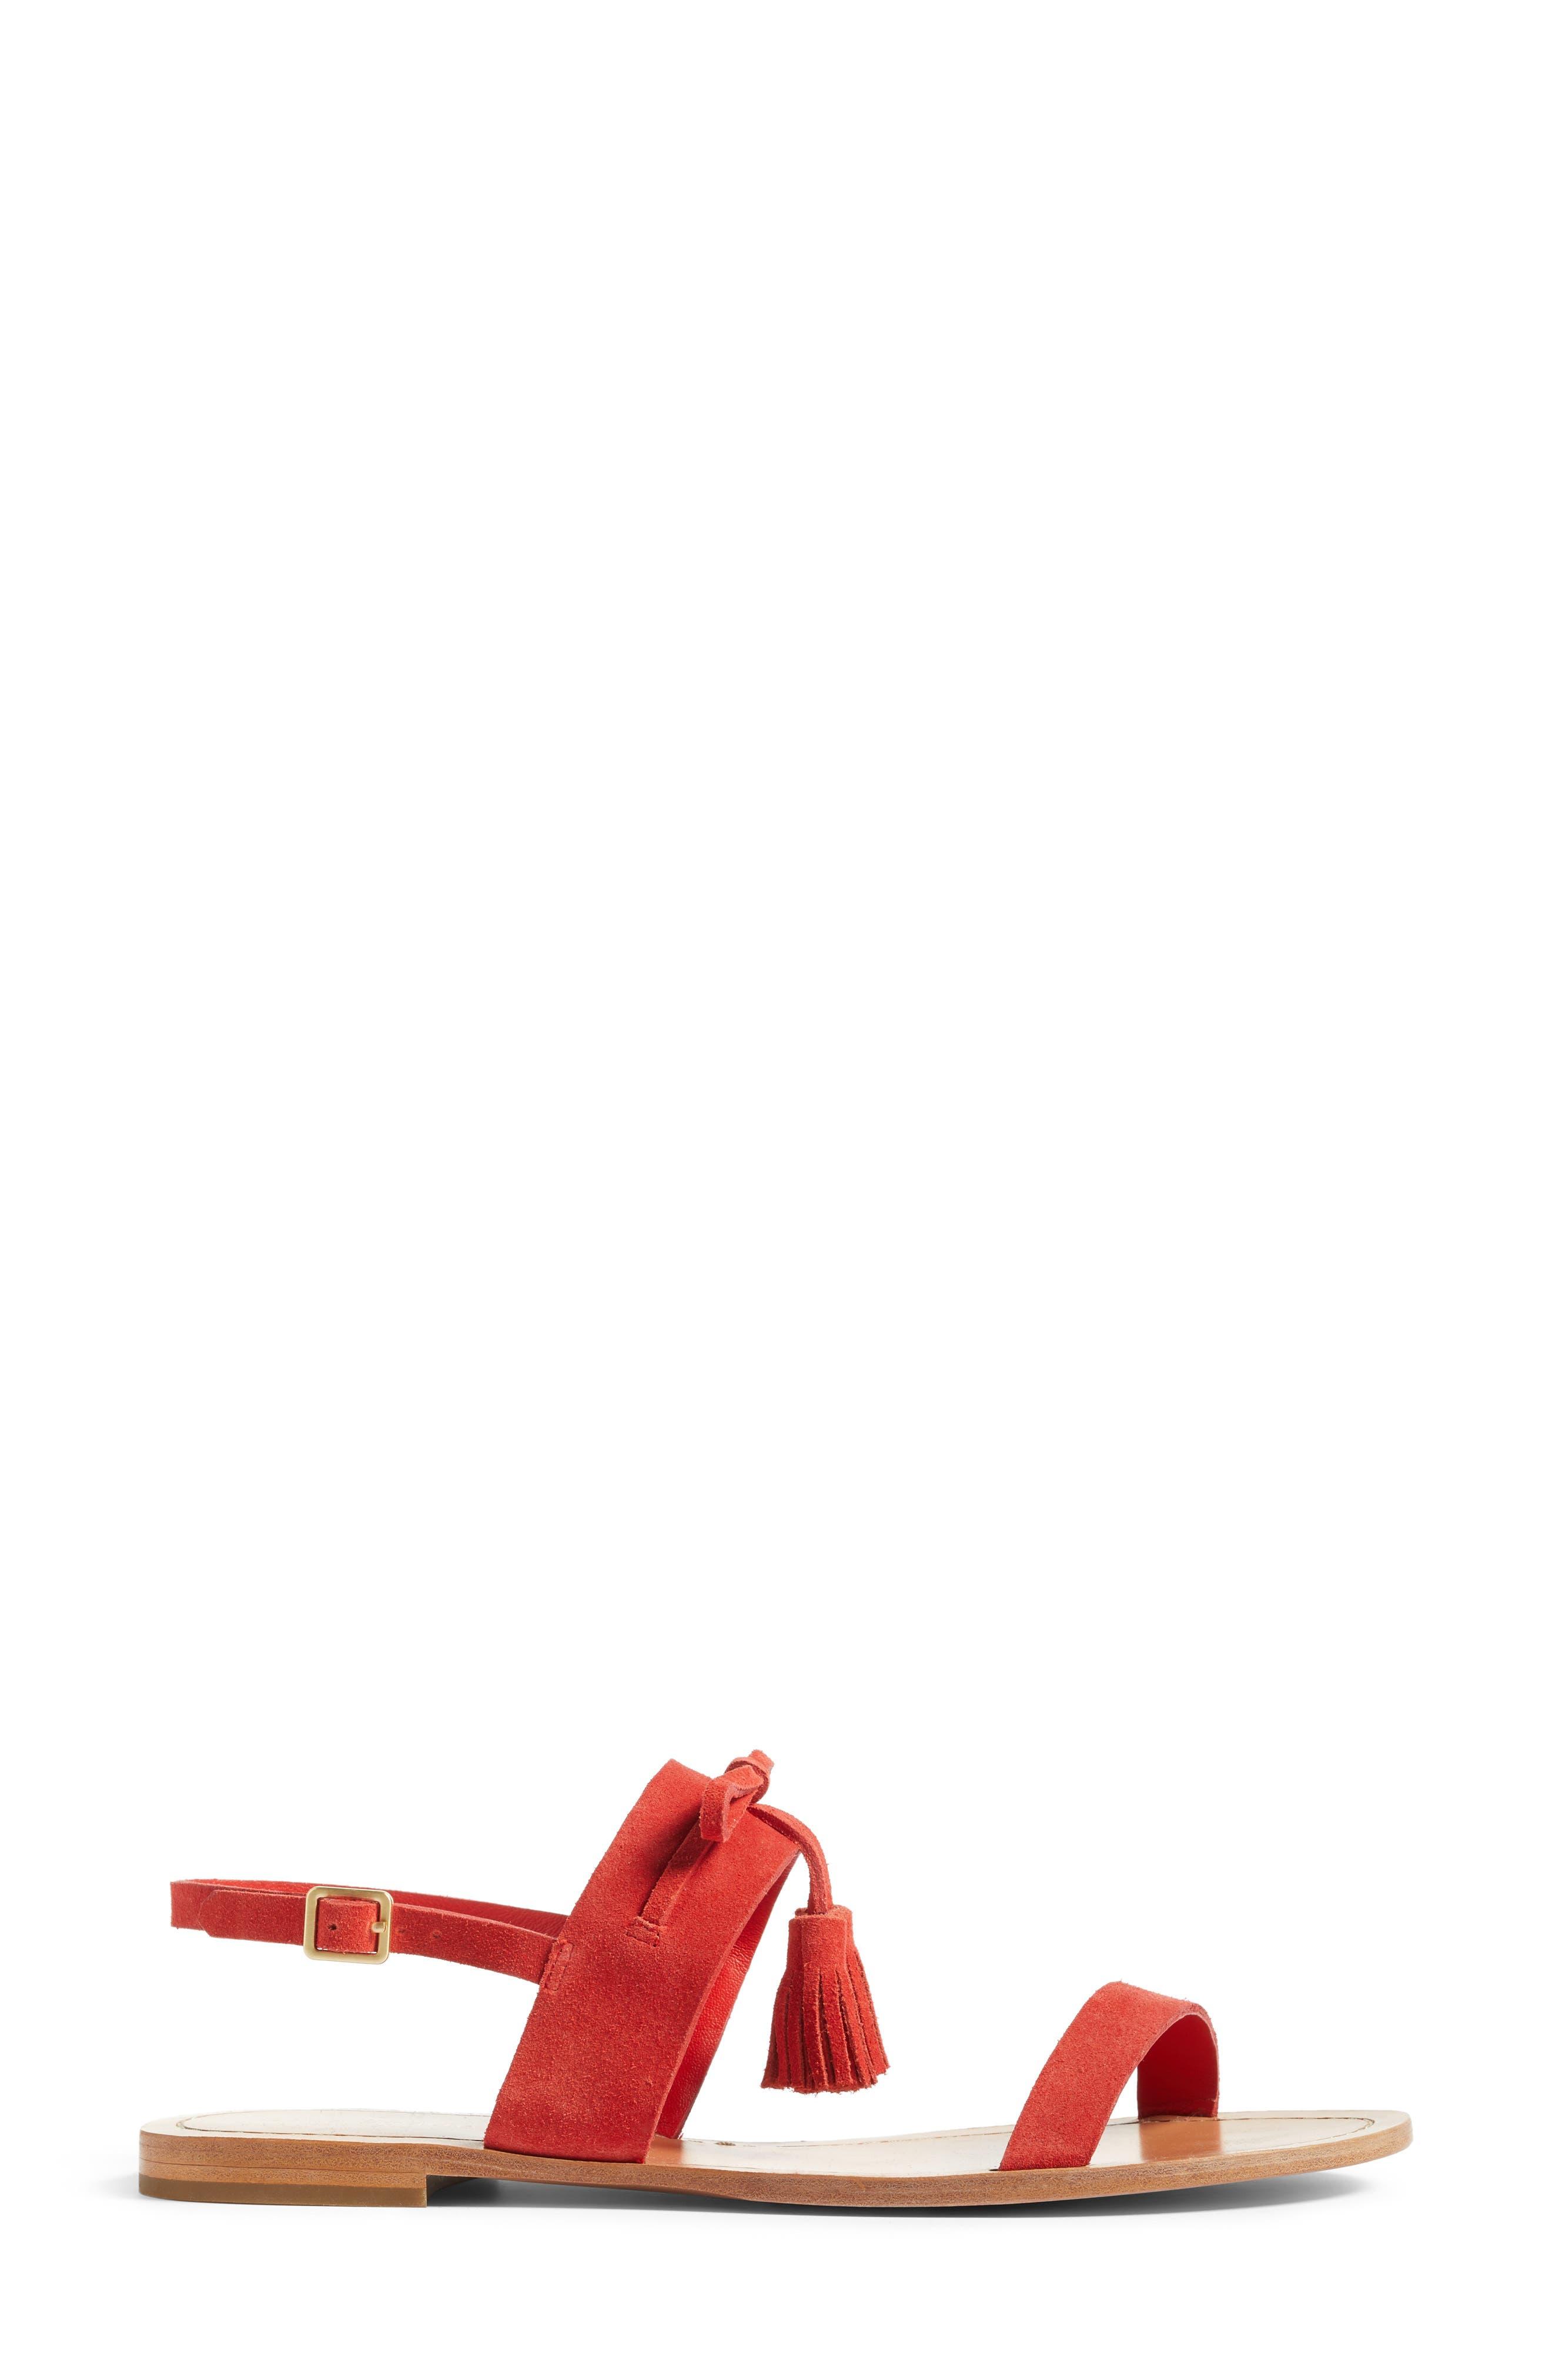 Alternate Image 3  - kate spade new york carlita tassel sandal (Women)